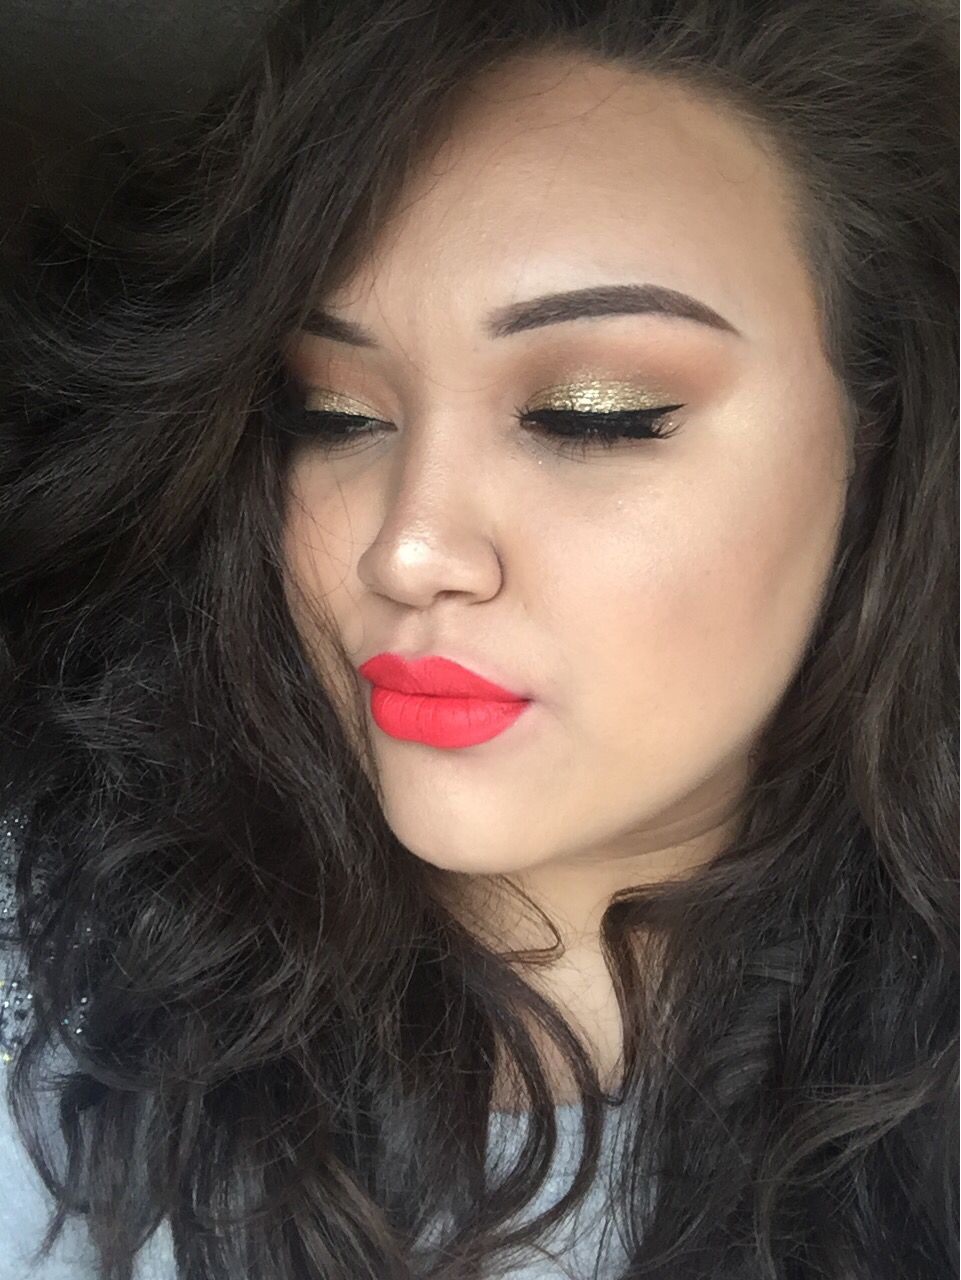 Lipland cosmetics and amrezy collab Liquid lipstick in